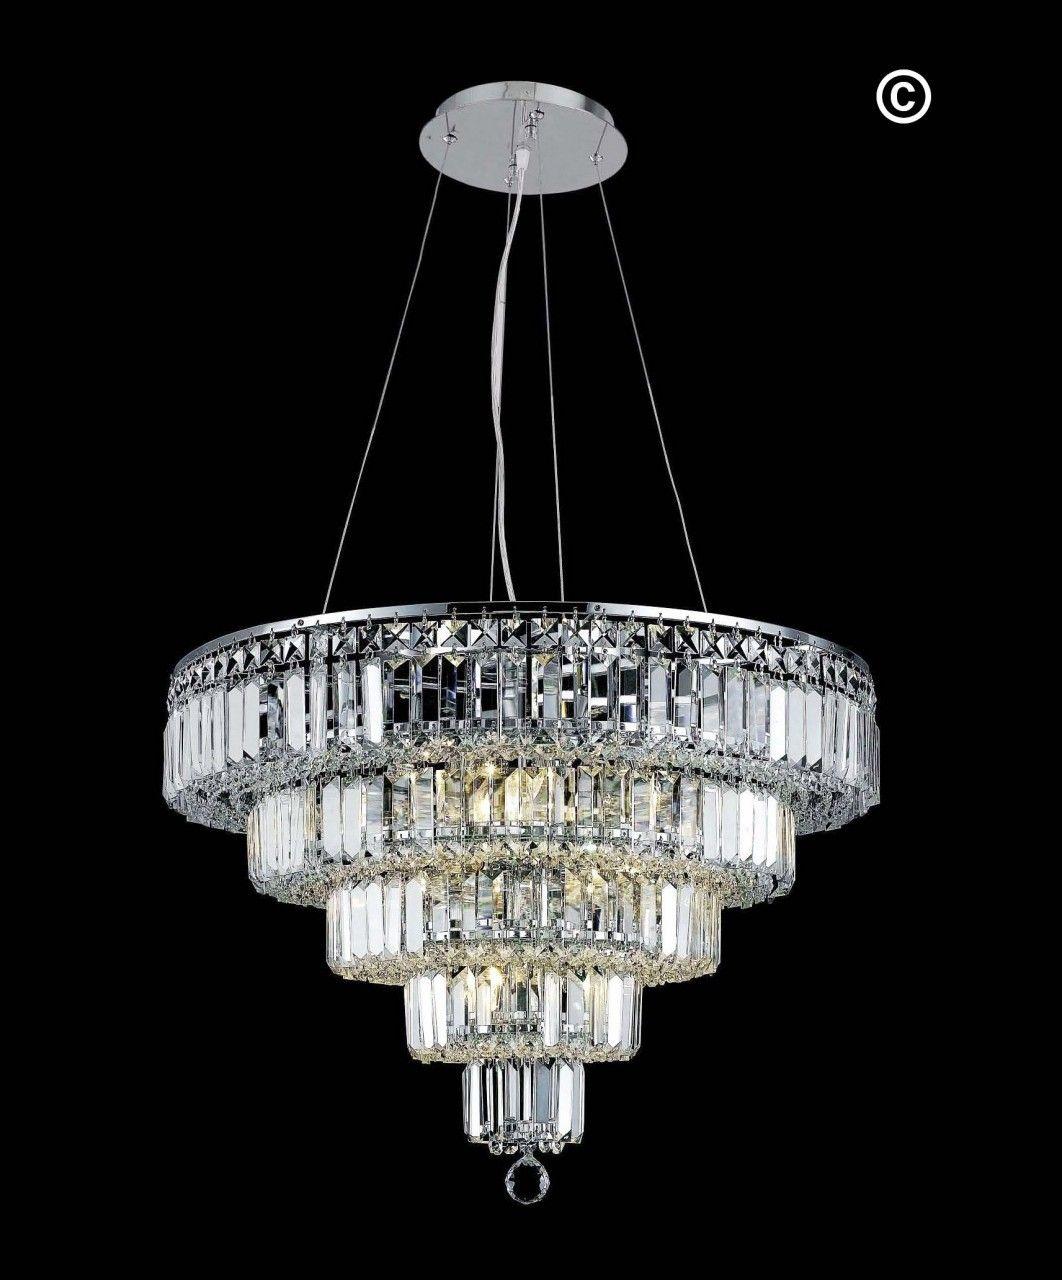 Modular 5 tier crystal pendant light chrome medium crystal designer chandelier australia pty ltd modular 5 tier crystal pendant light chrome medium arubaitofo Gallery